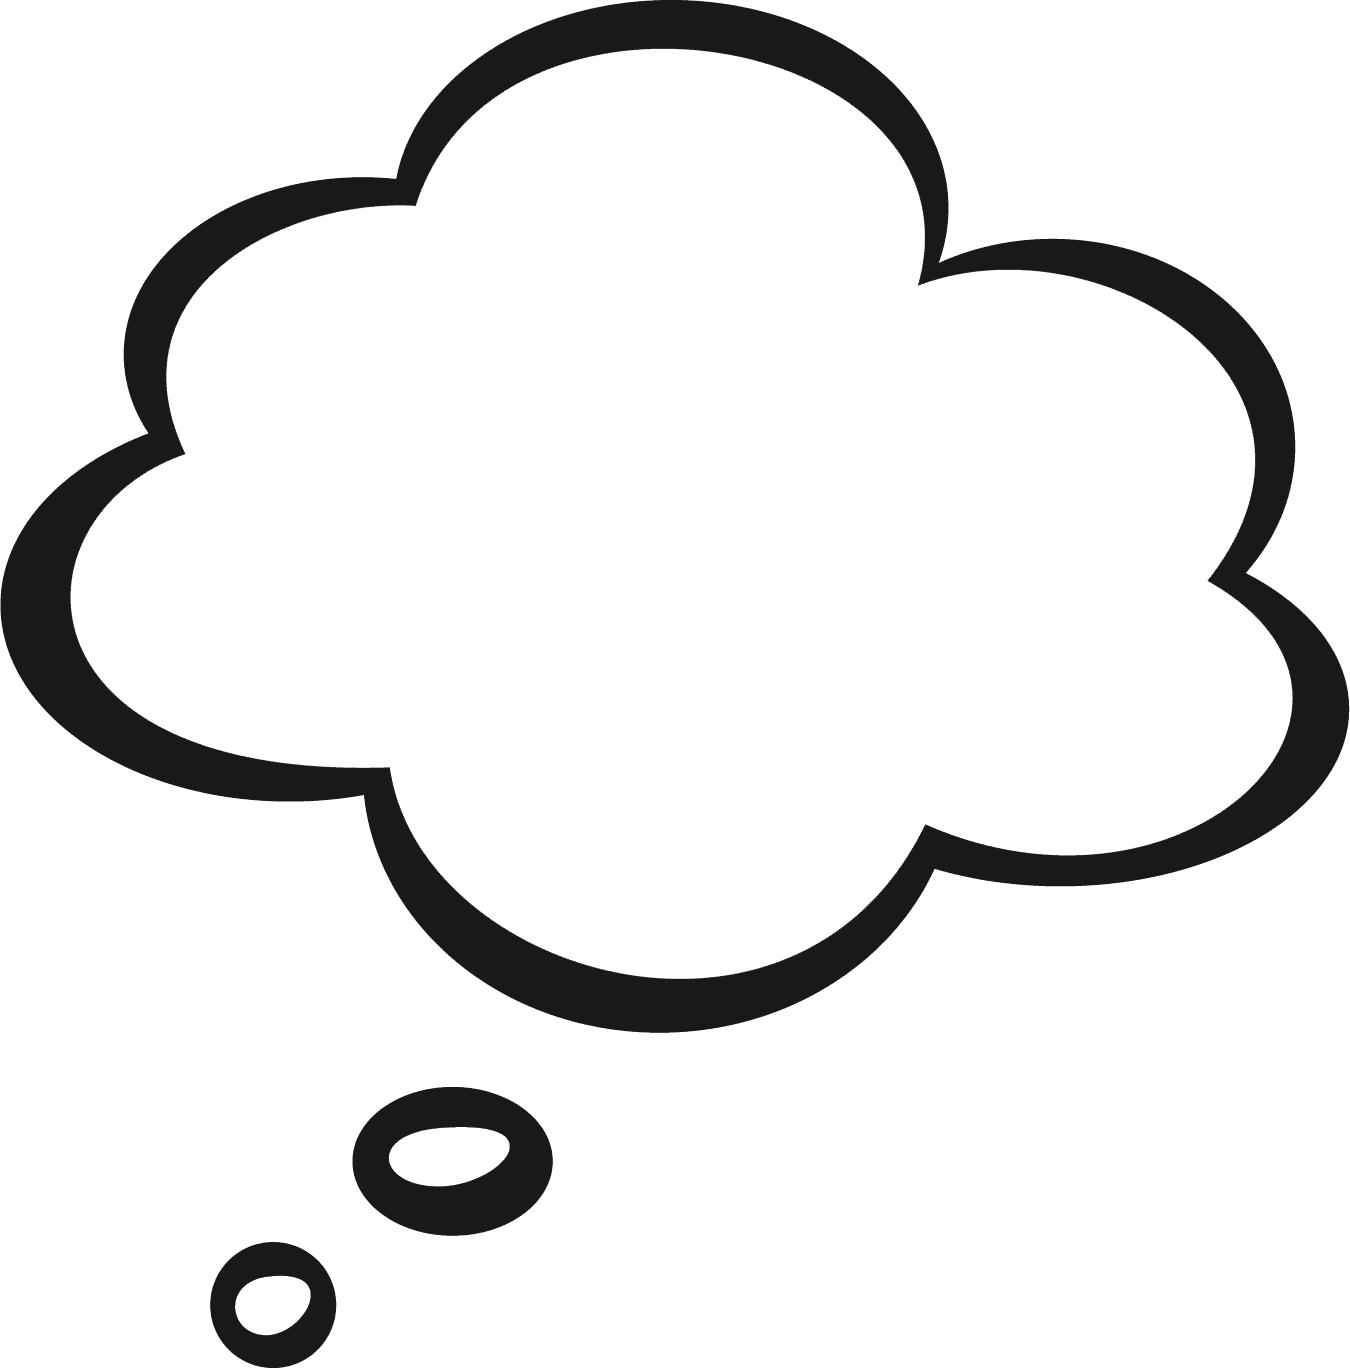 1350x1368 Speech Bubbles Thought Bubble Word Bubbleic Speech Clip Art